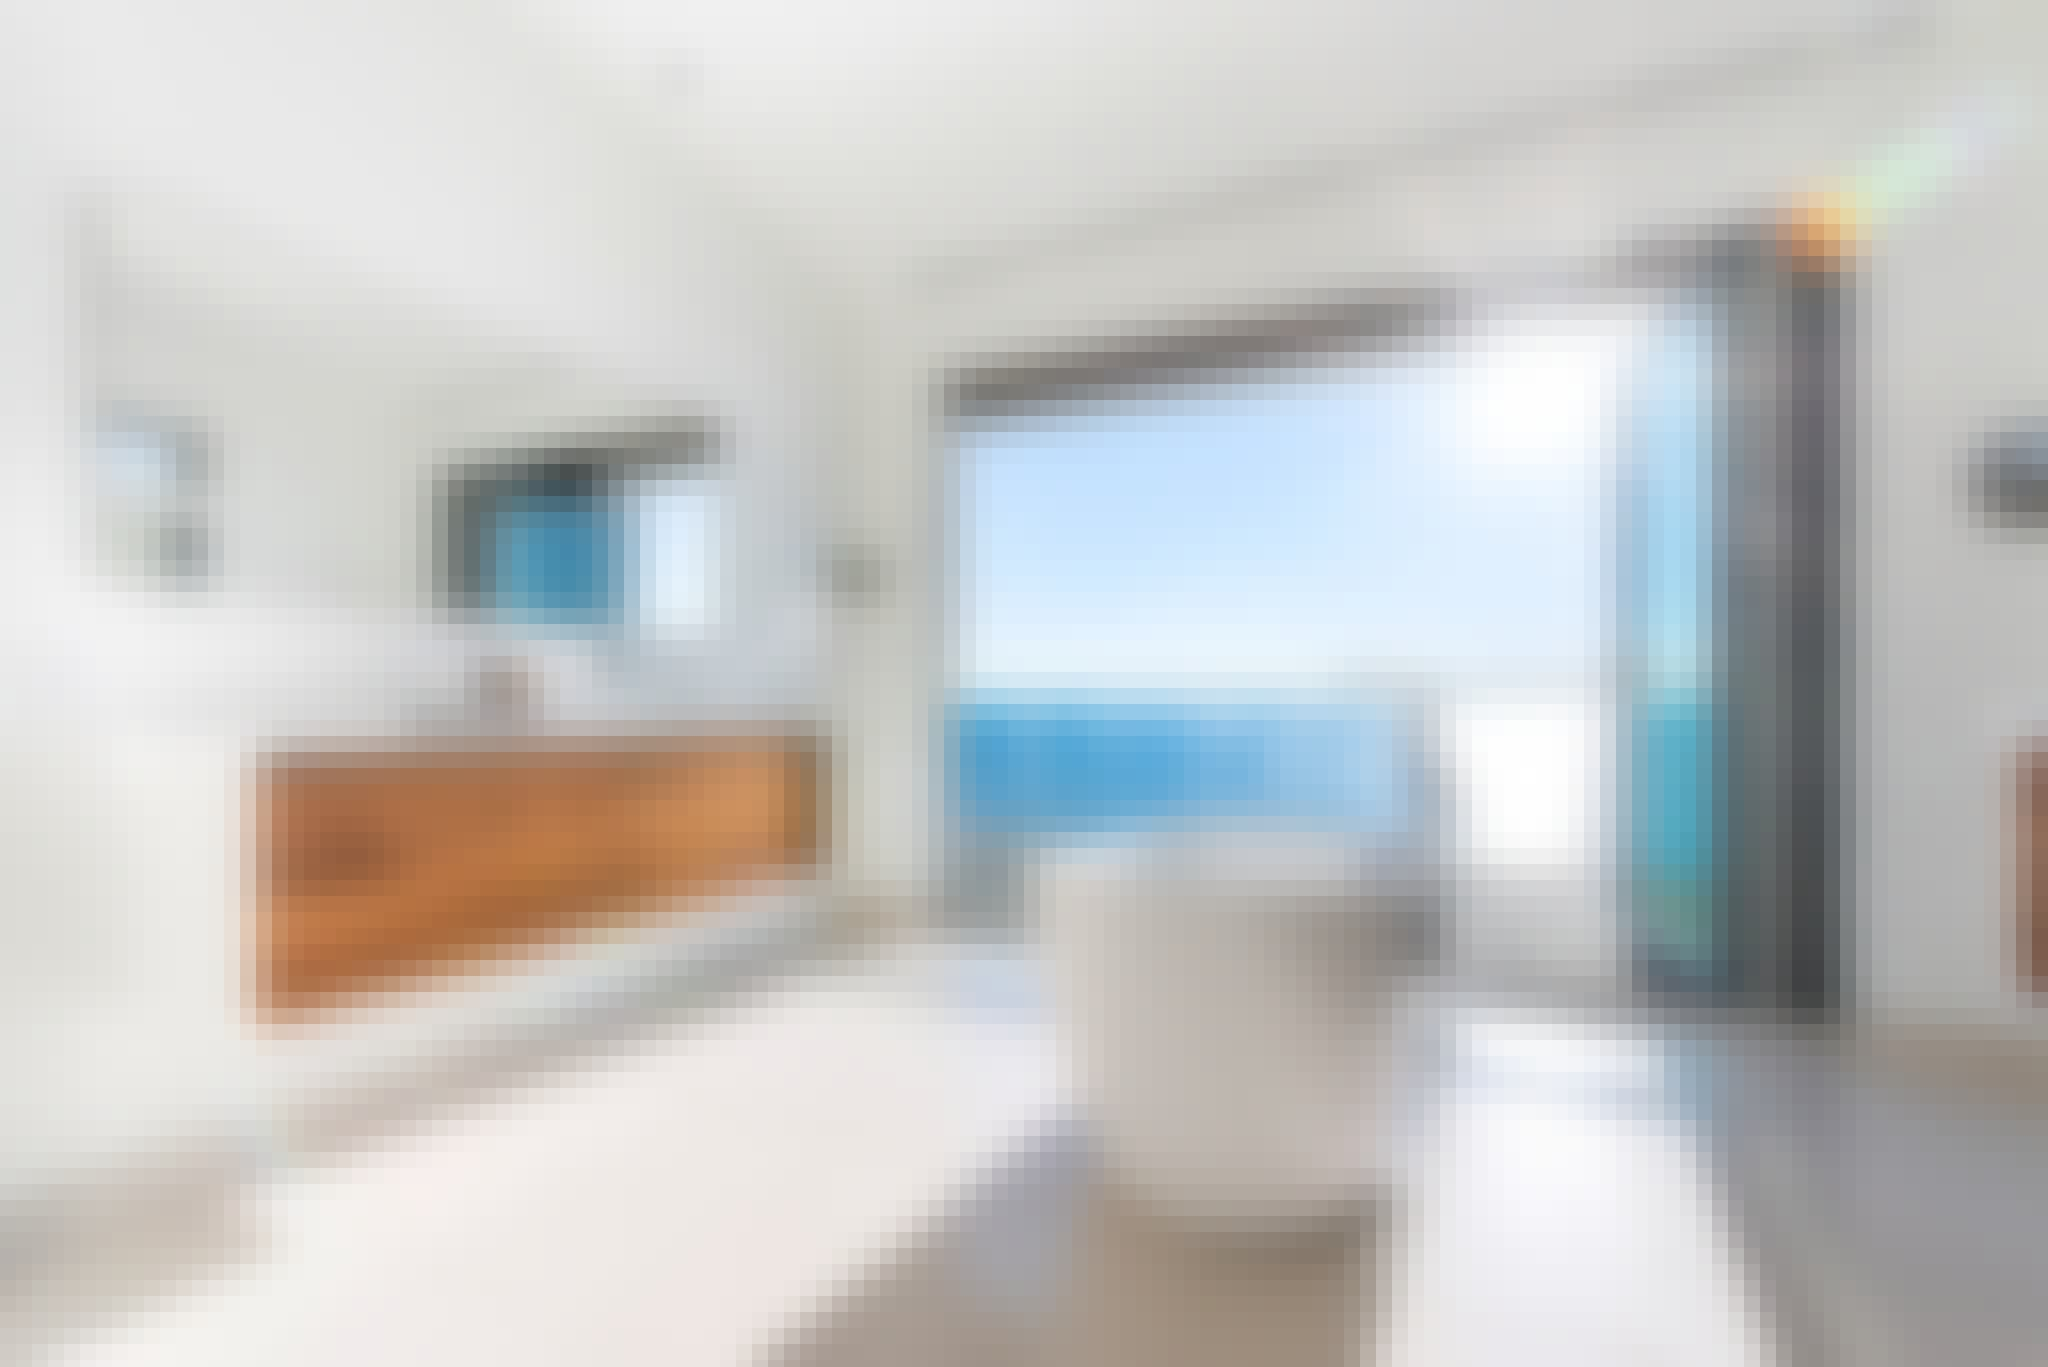 retractable glass walls create bathroom oasis